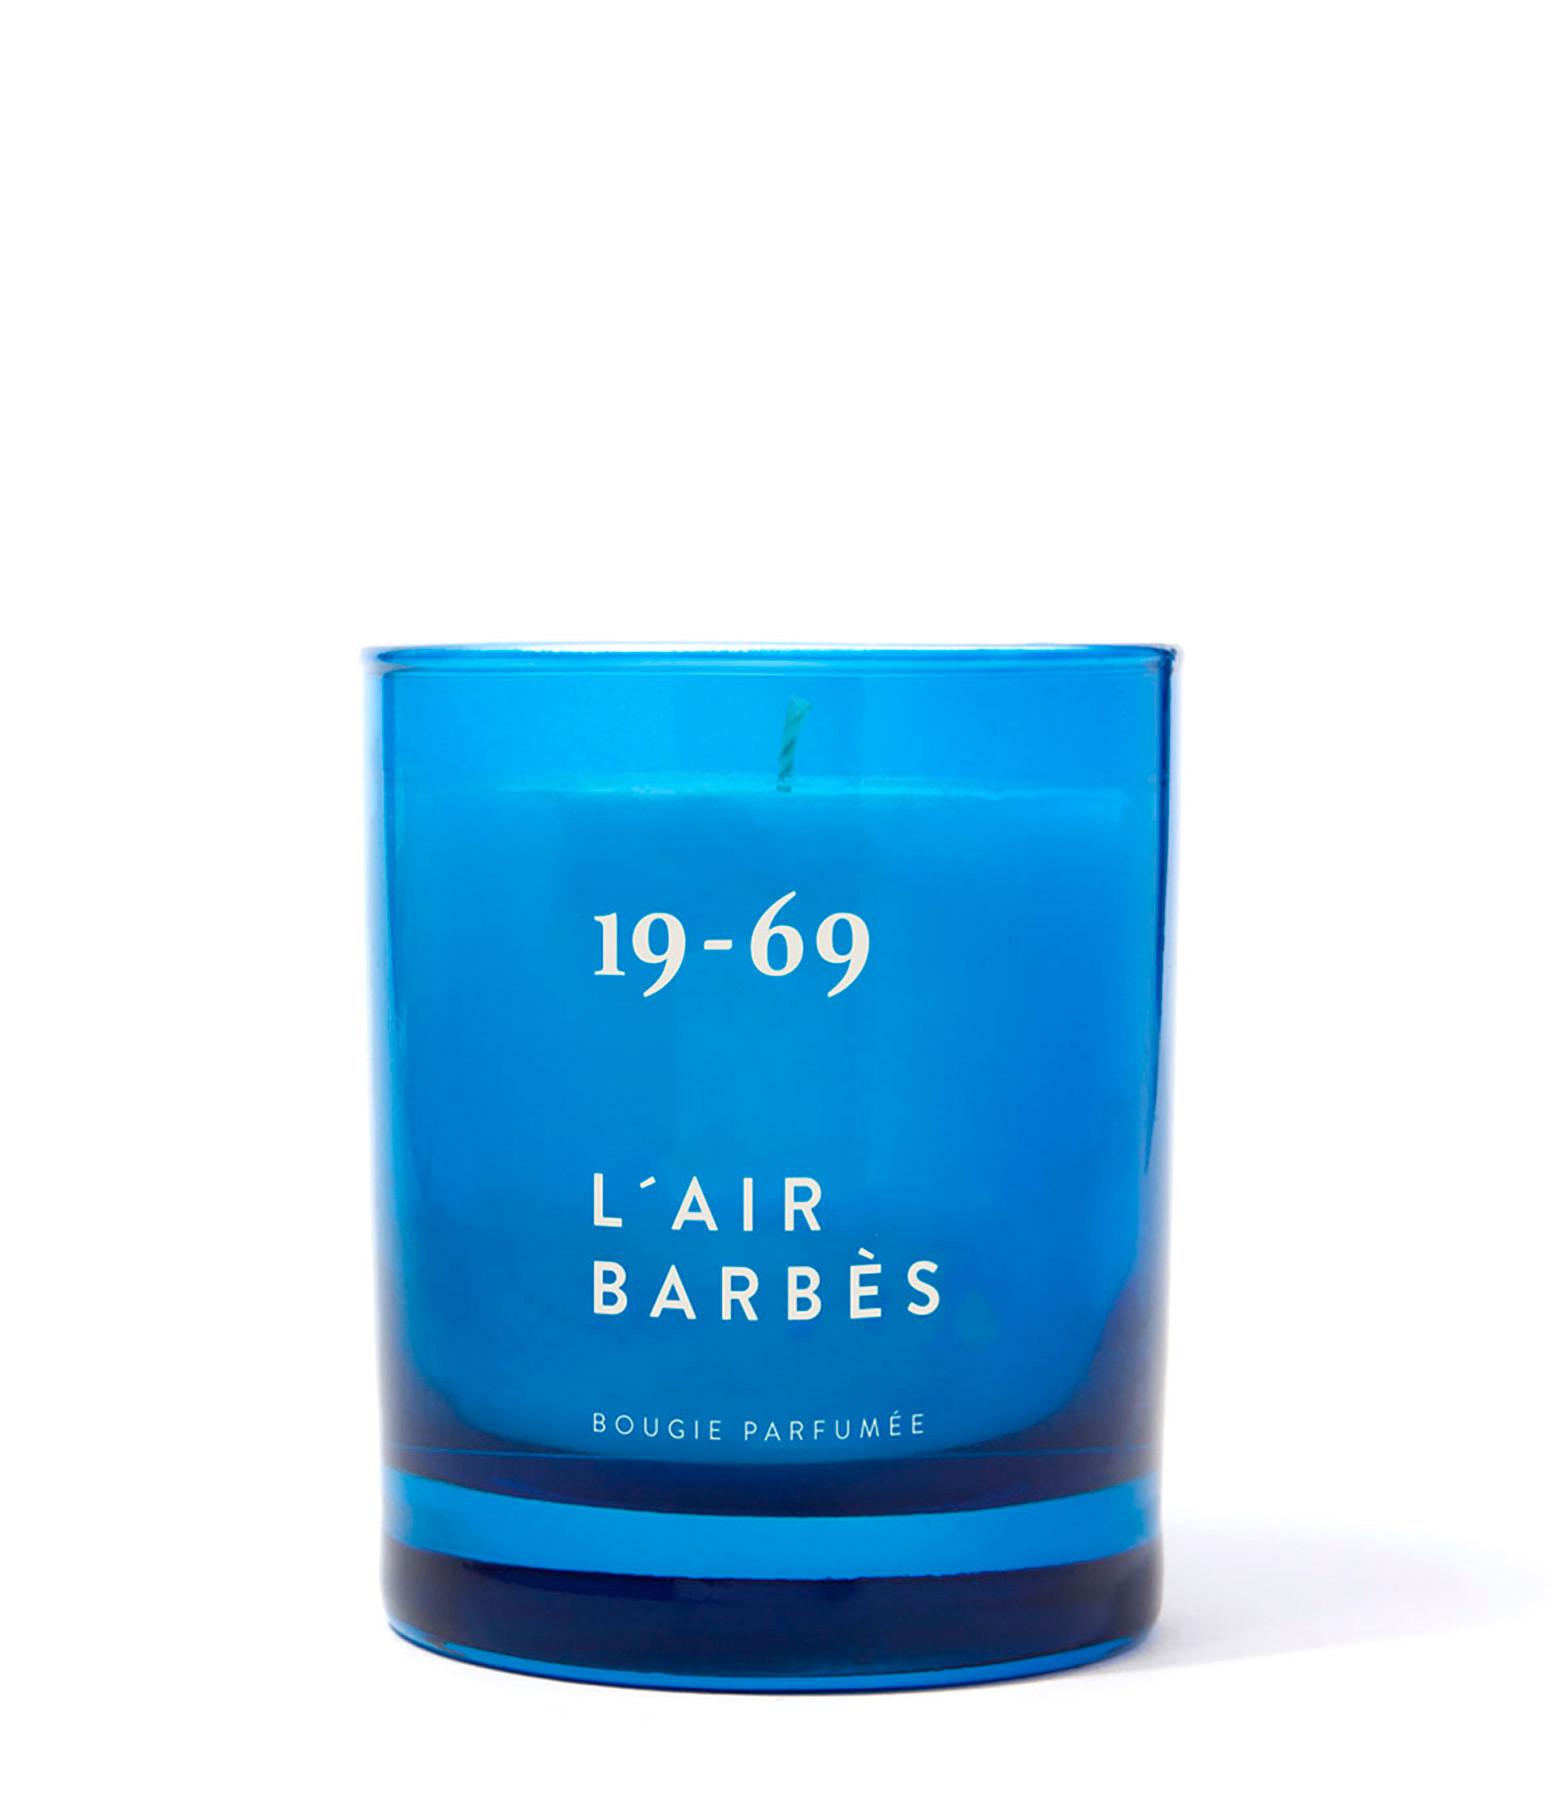 19-69 - Bougie L'air Barbès 200 ml